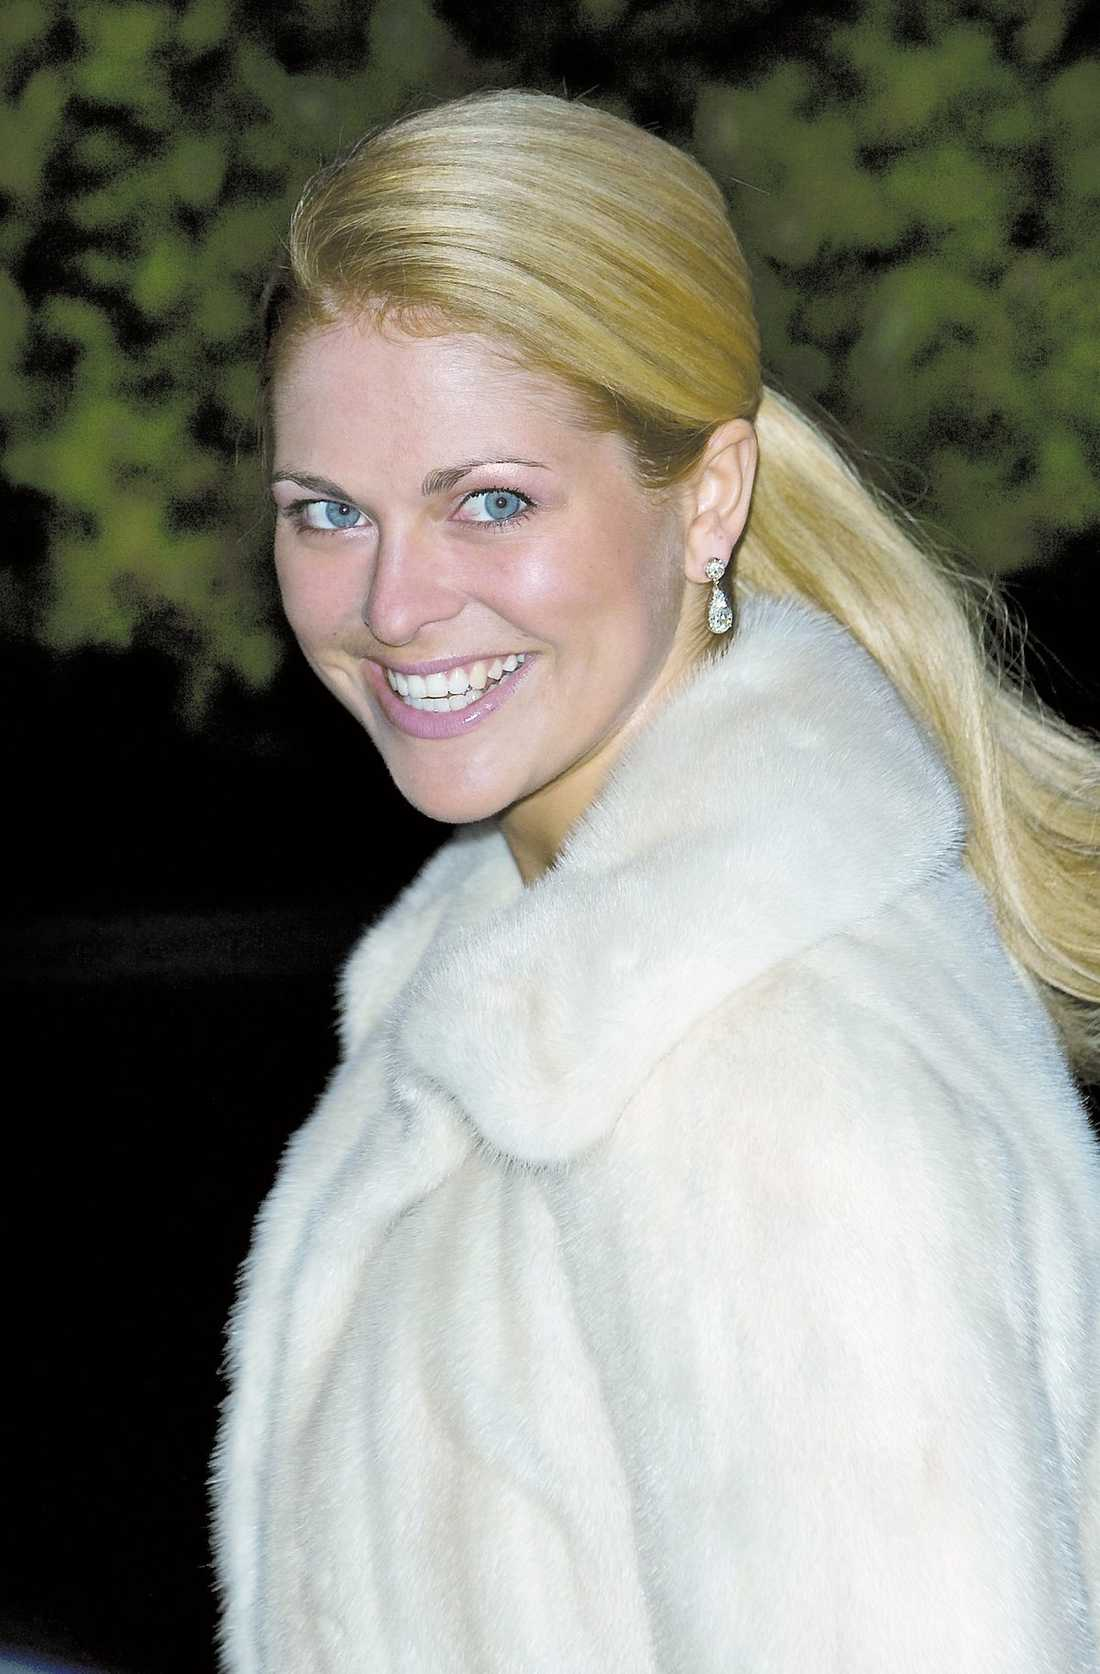 643cb06e9f5a Prinsessan Madeleines bröllopsplaner ligger på is tills kronprinsessan har  gift sig.